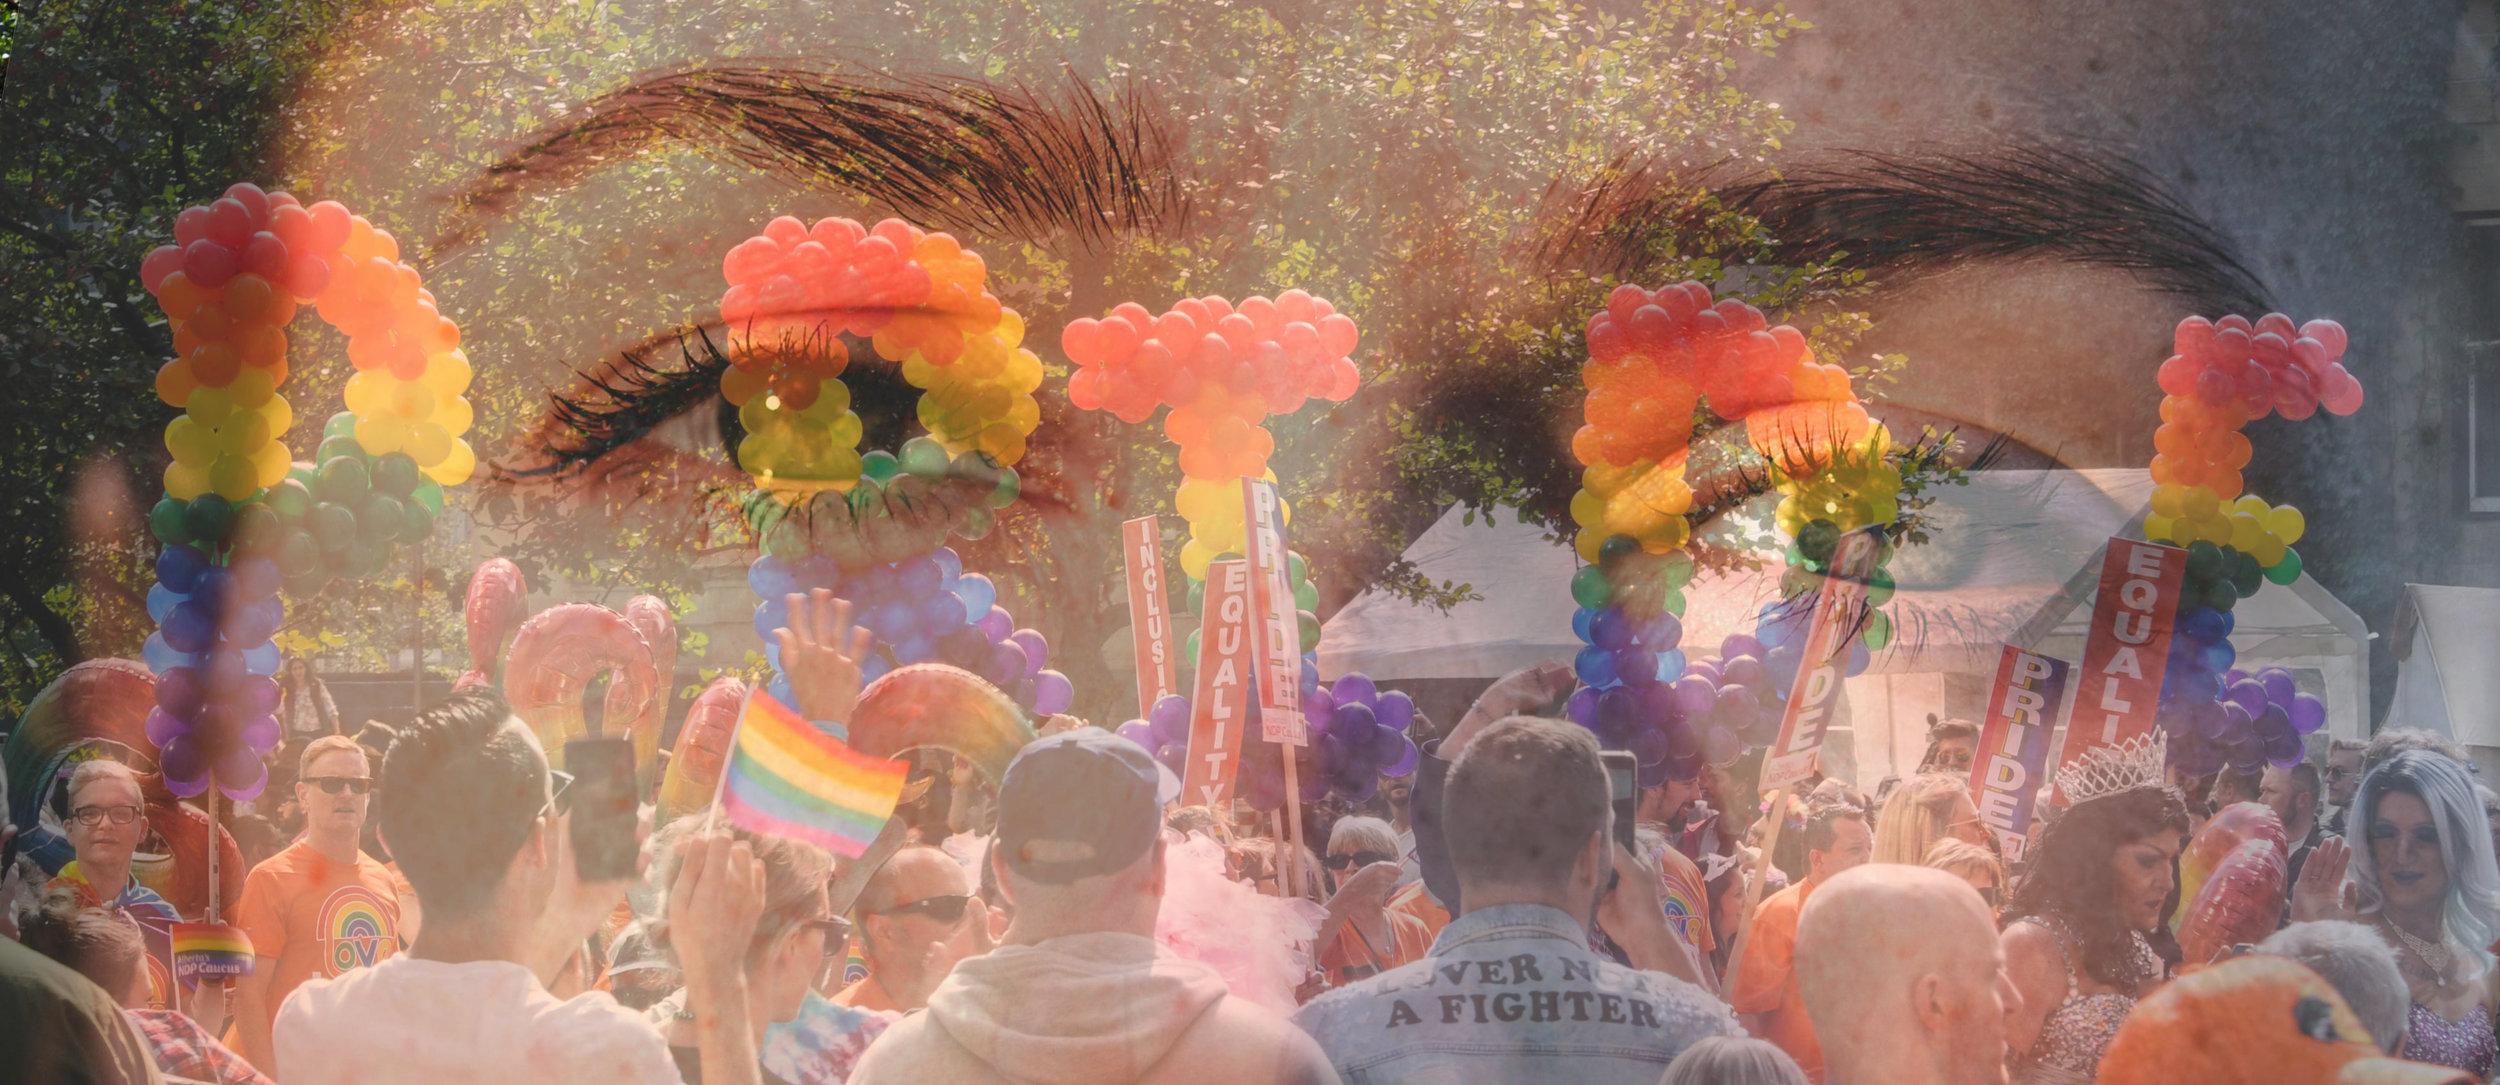 LGBT Struggles Unsplash Edited.jpg